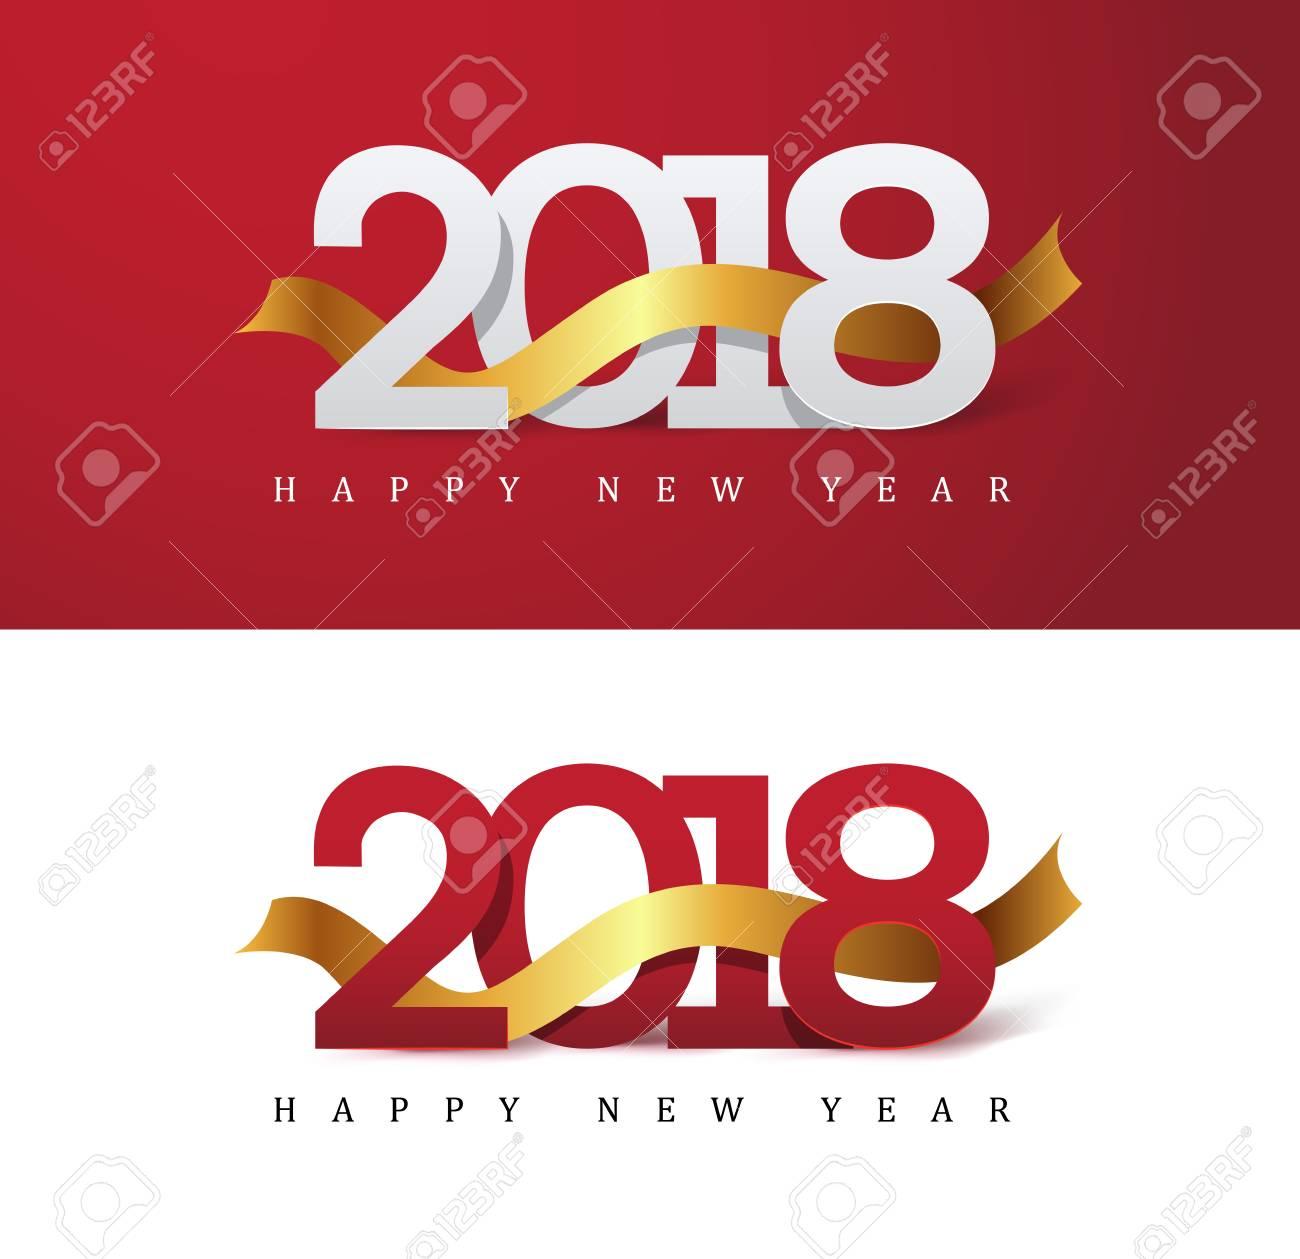 2018 new year greeting card vector illustrationwallpaper stock vector 90424978